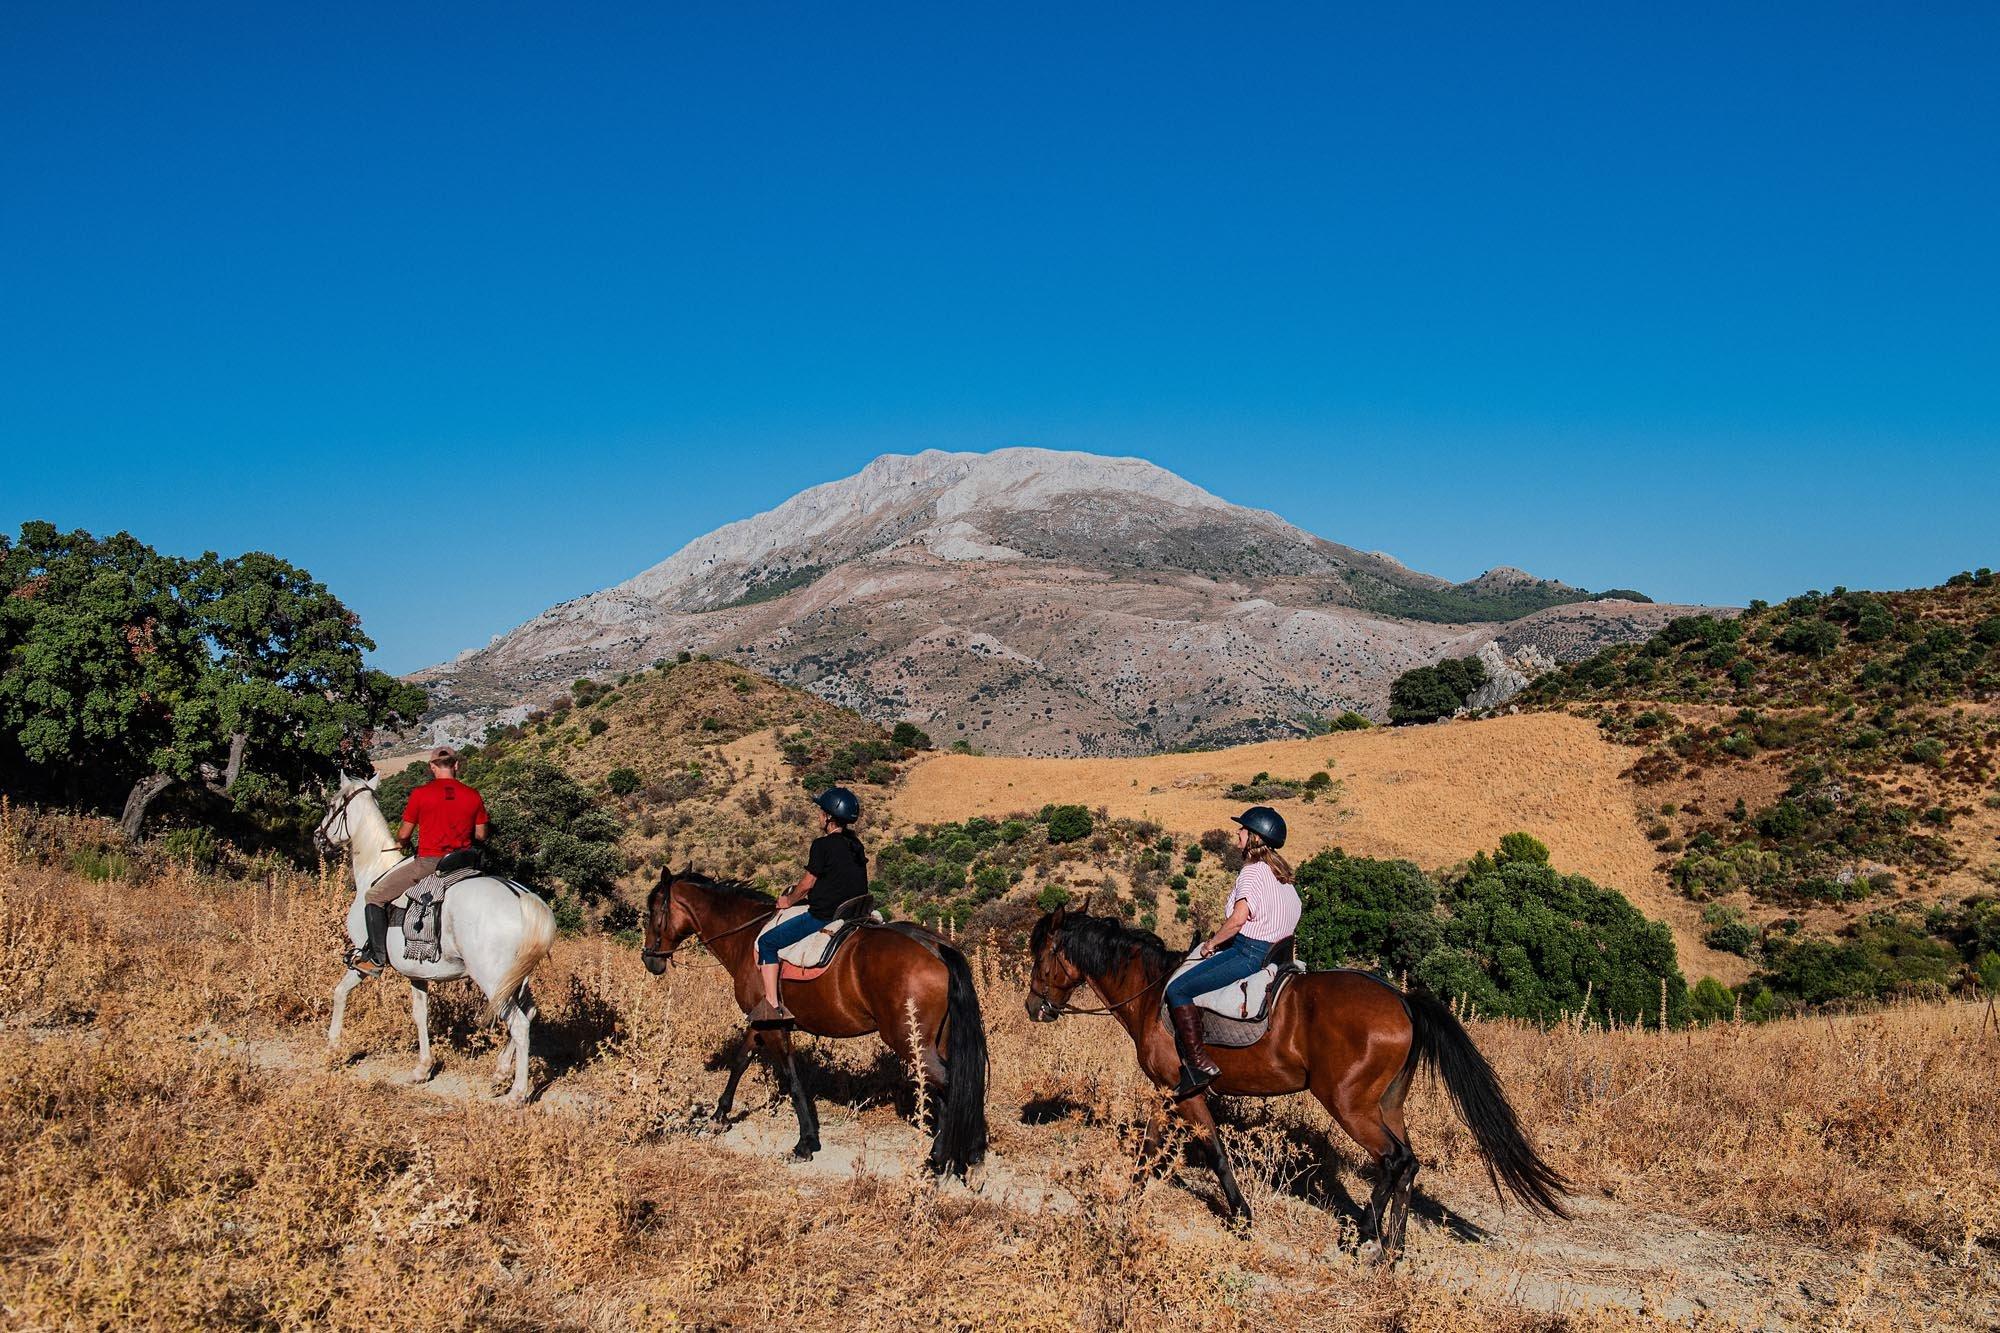 La Fuensanta, hiking route Sierra de las Nieves, Malaga